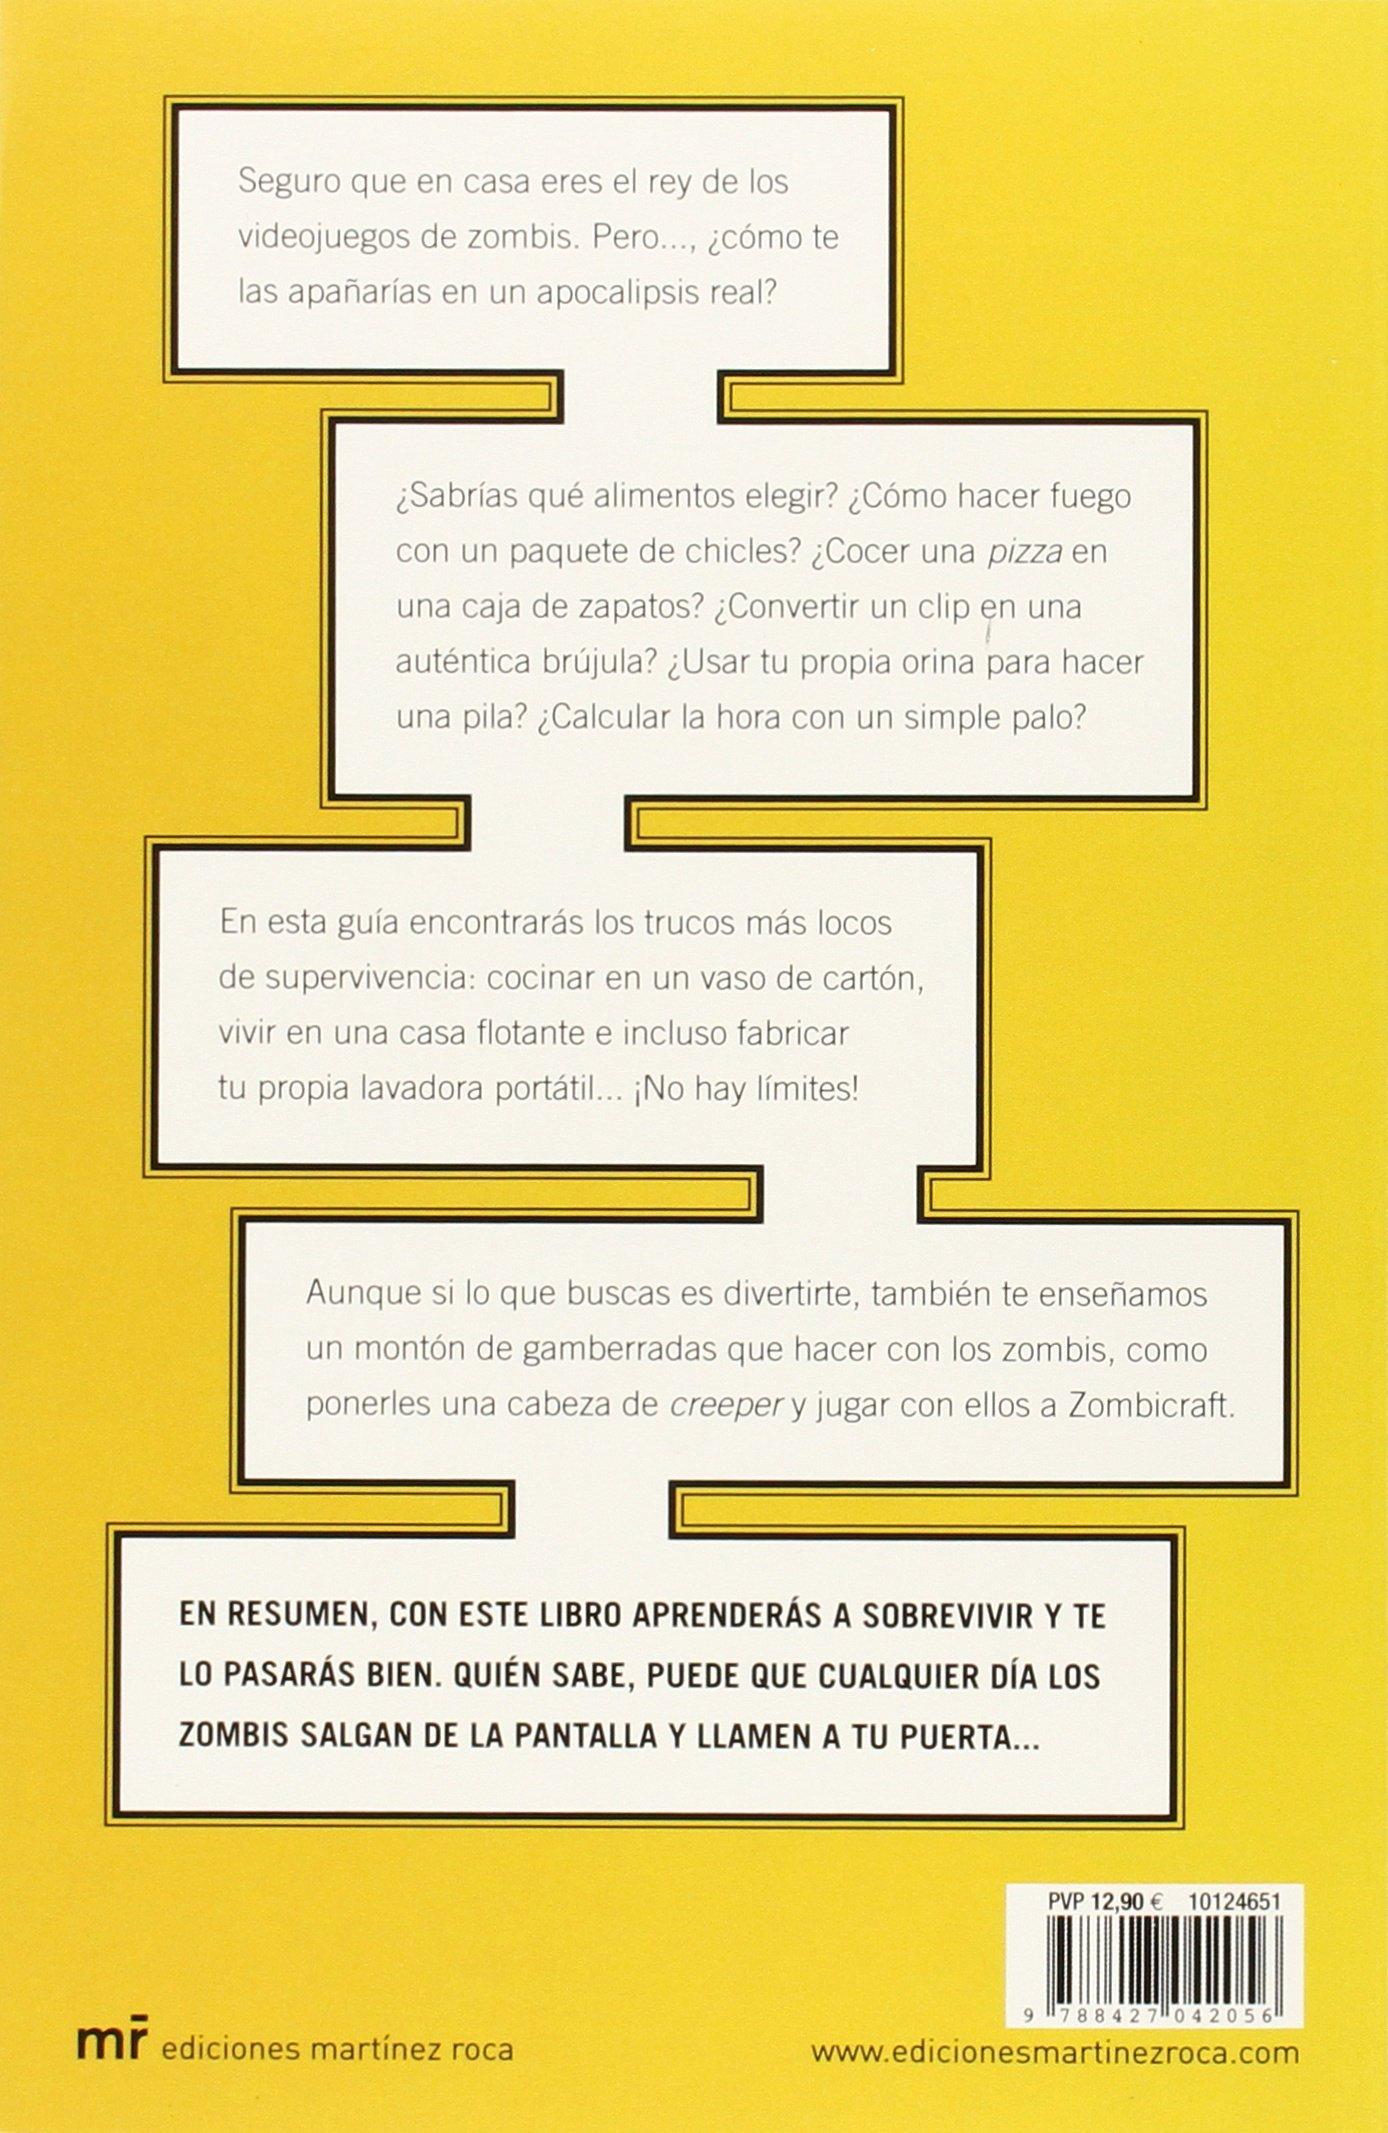 Cómo sobrevivir a un apocalipsis zombi: Jesús Cibantos Muñoz, Natalia Machuca Tello: 9788427042056: Amazon.com: Books